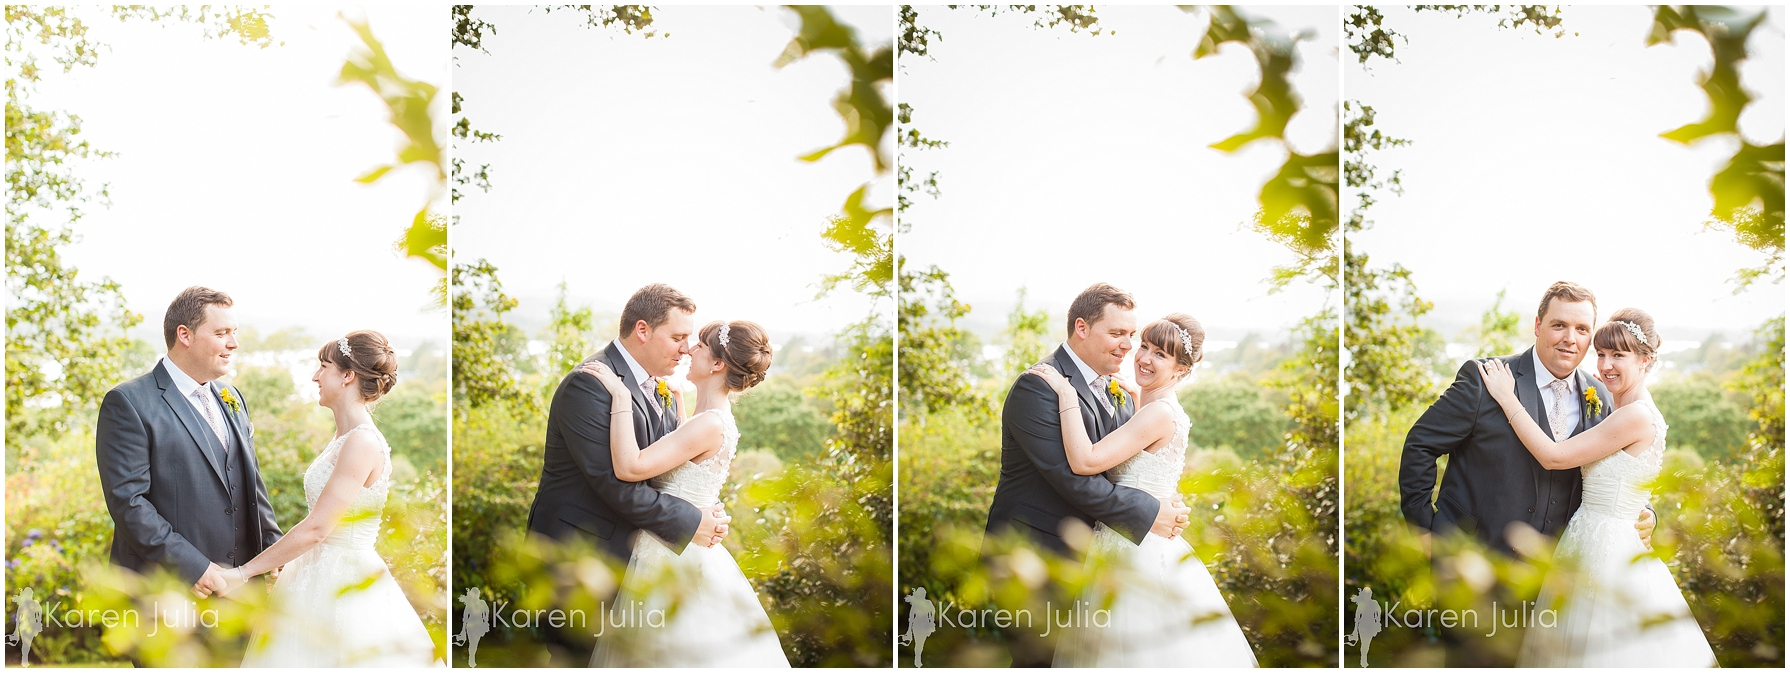 Miller-Howe-Hotel-Summer-Wedding-Photography-21